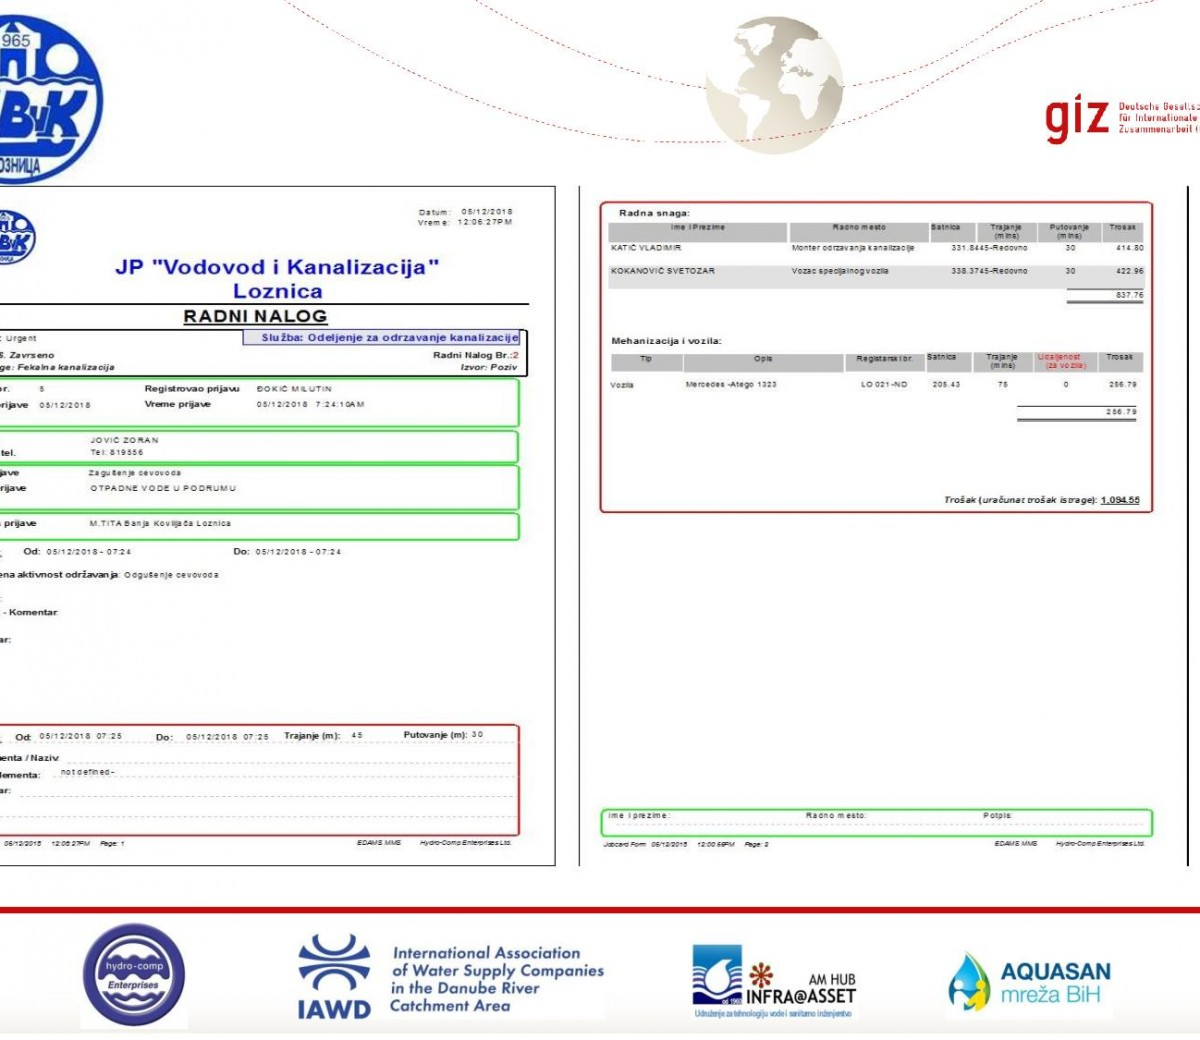 opr00001.tmp-page-015